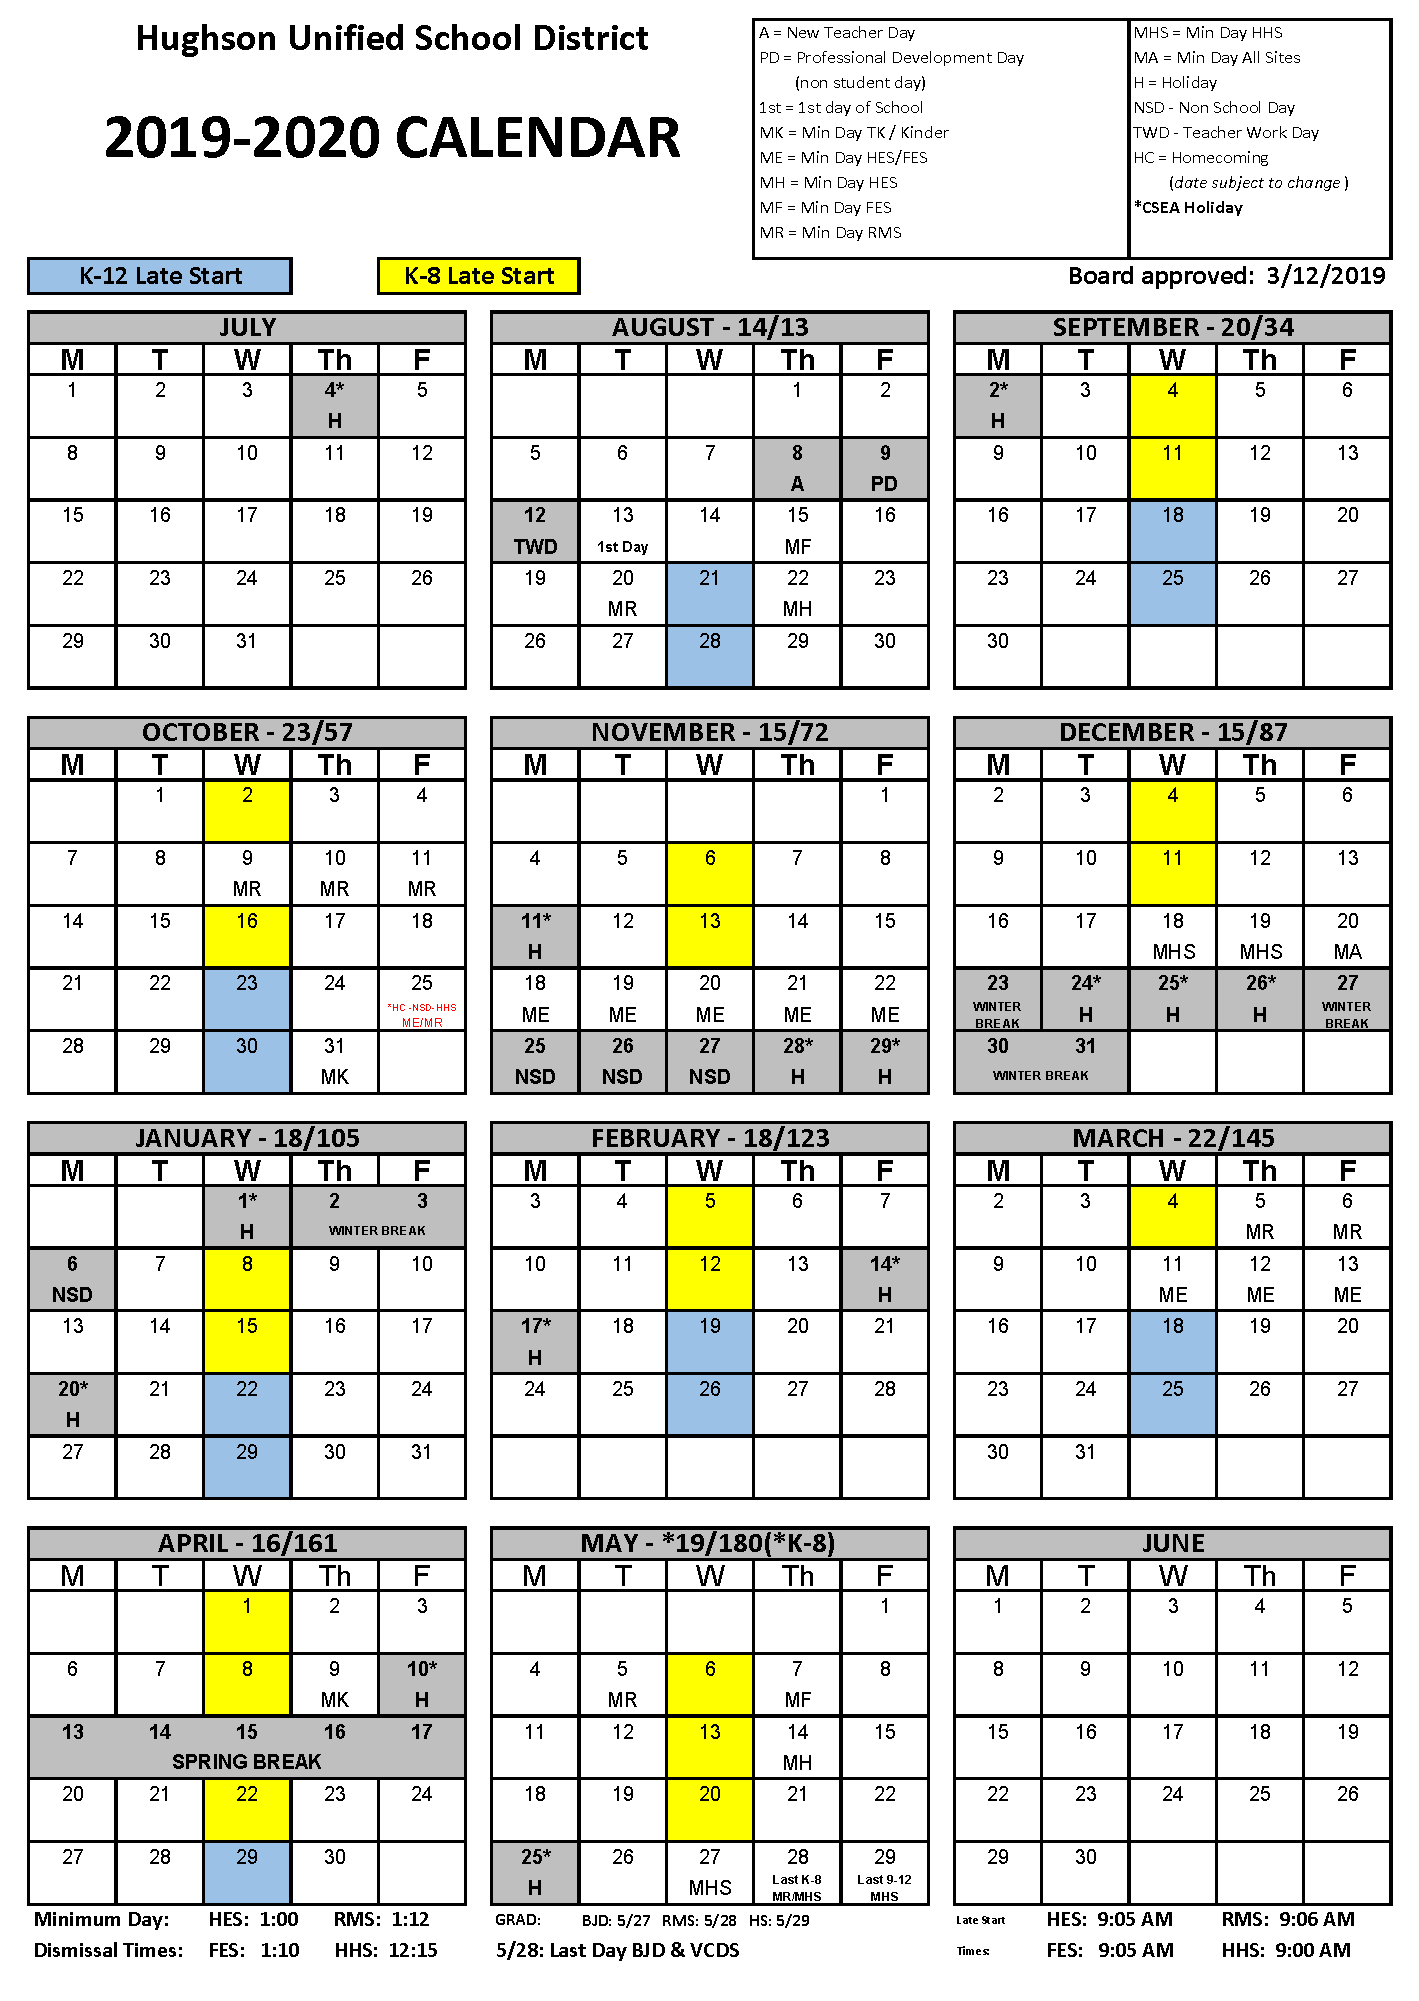 Calendar - Hughson Unified School District